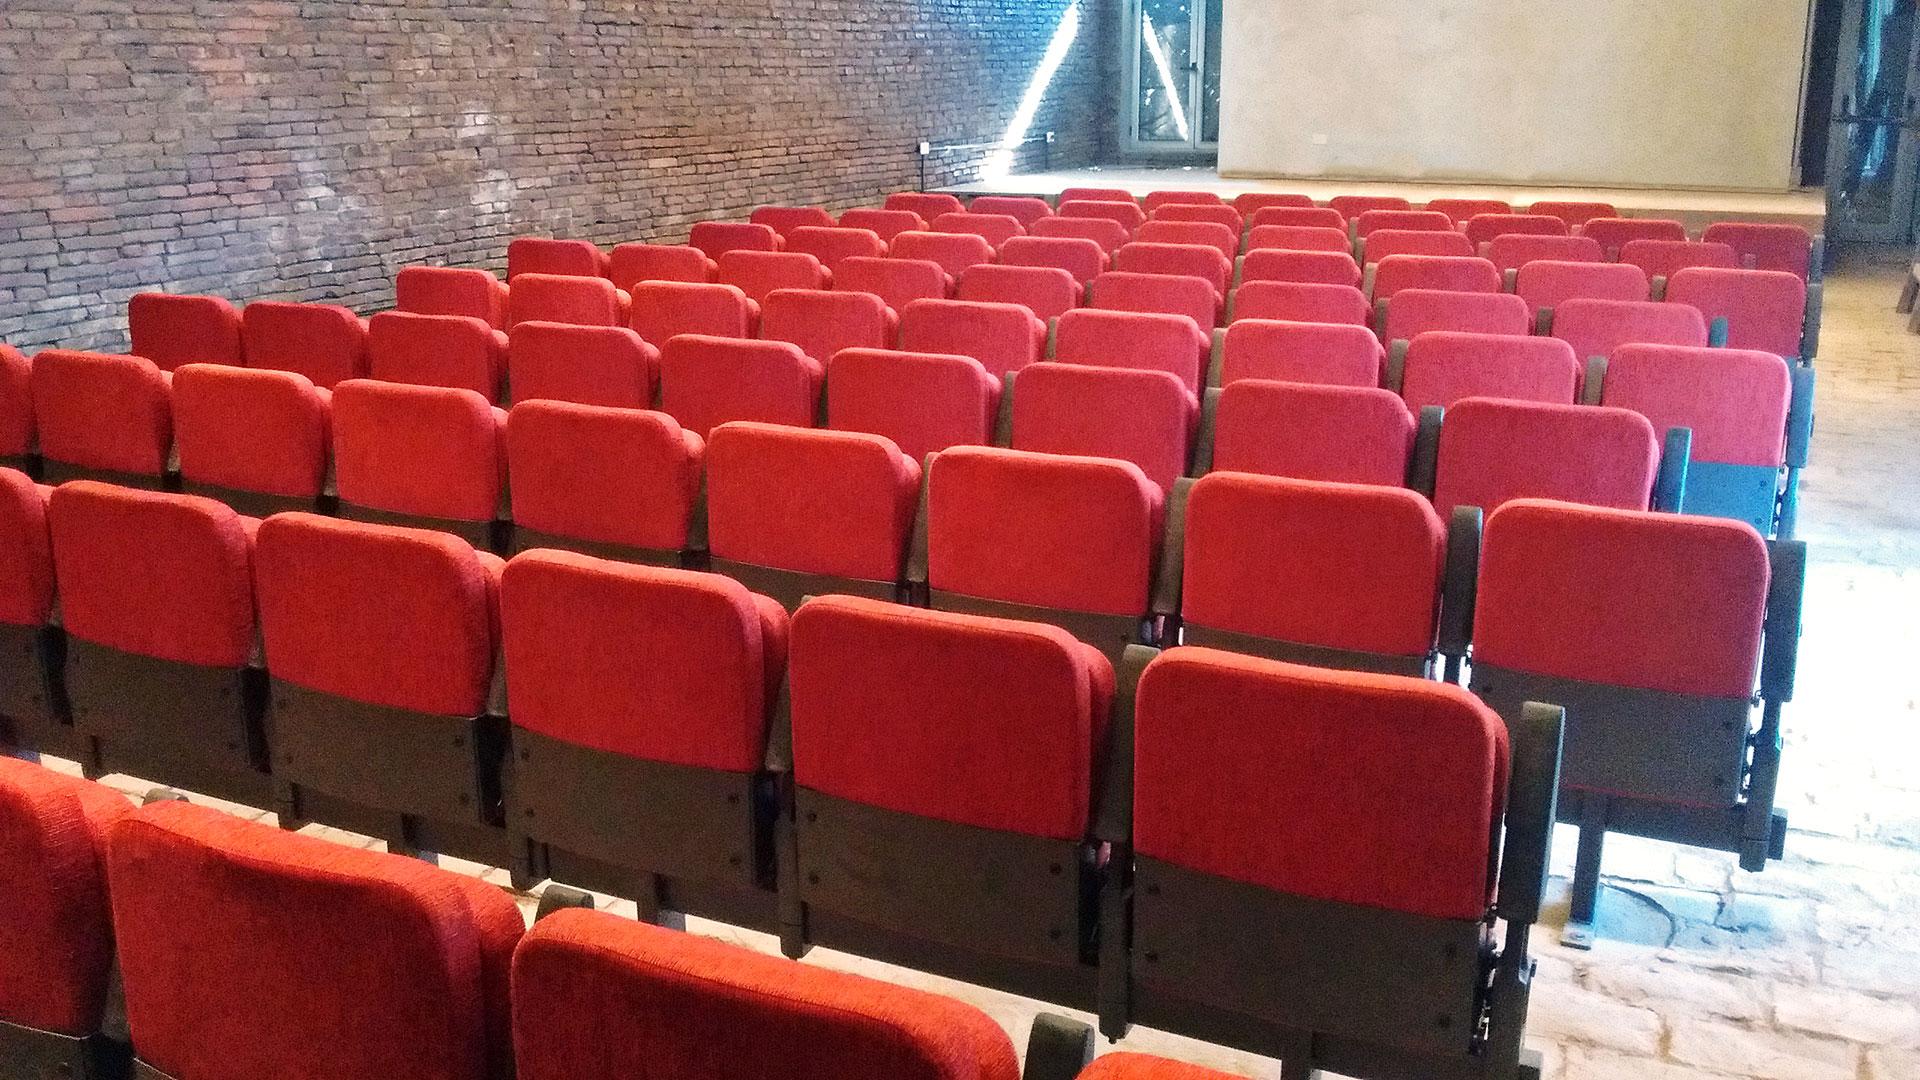 Unsada auditorio